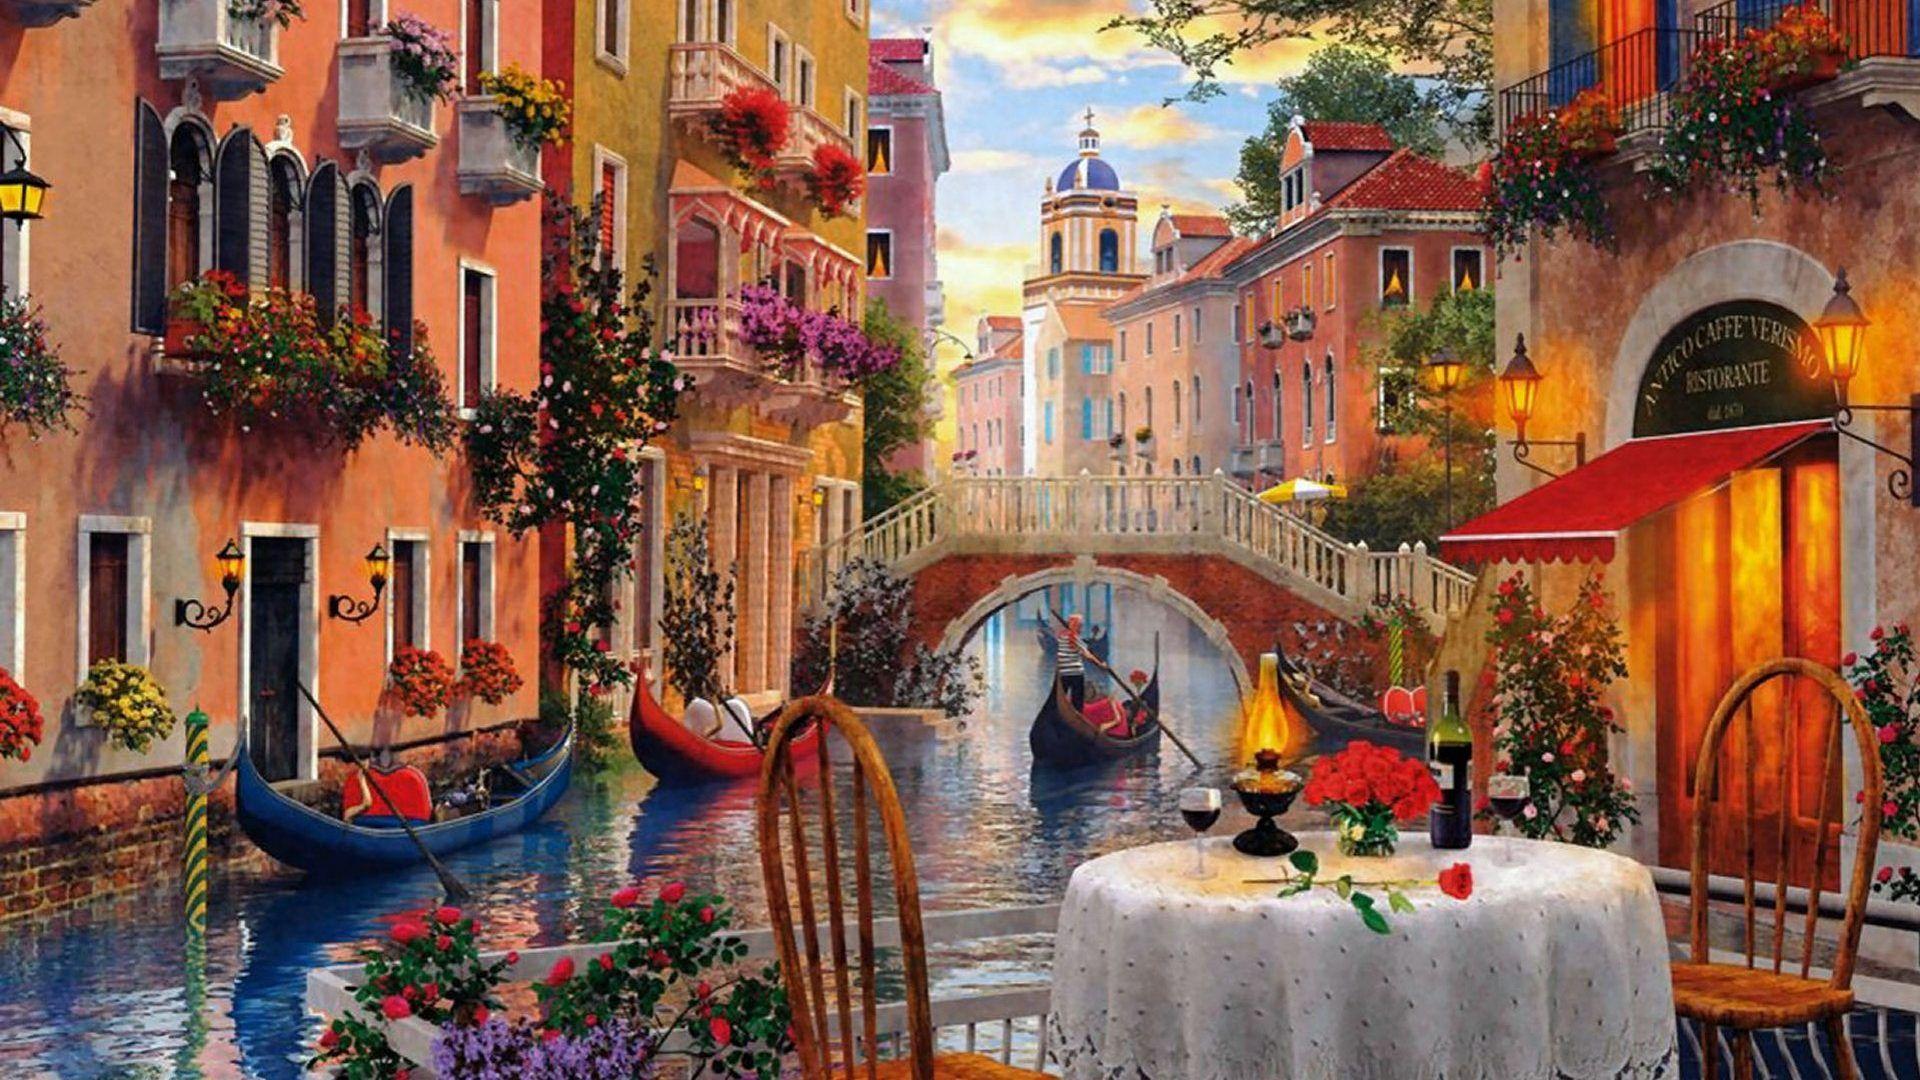 Venice Ca Restaurants Italian